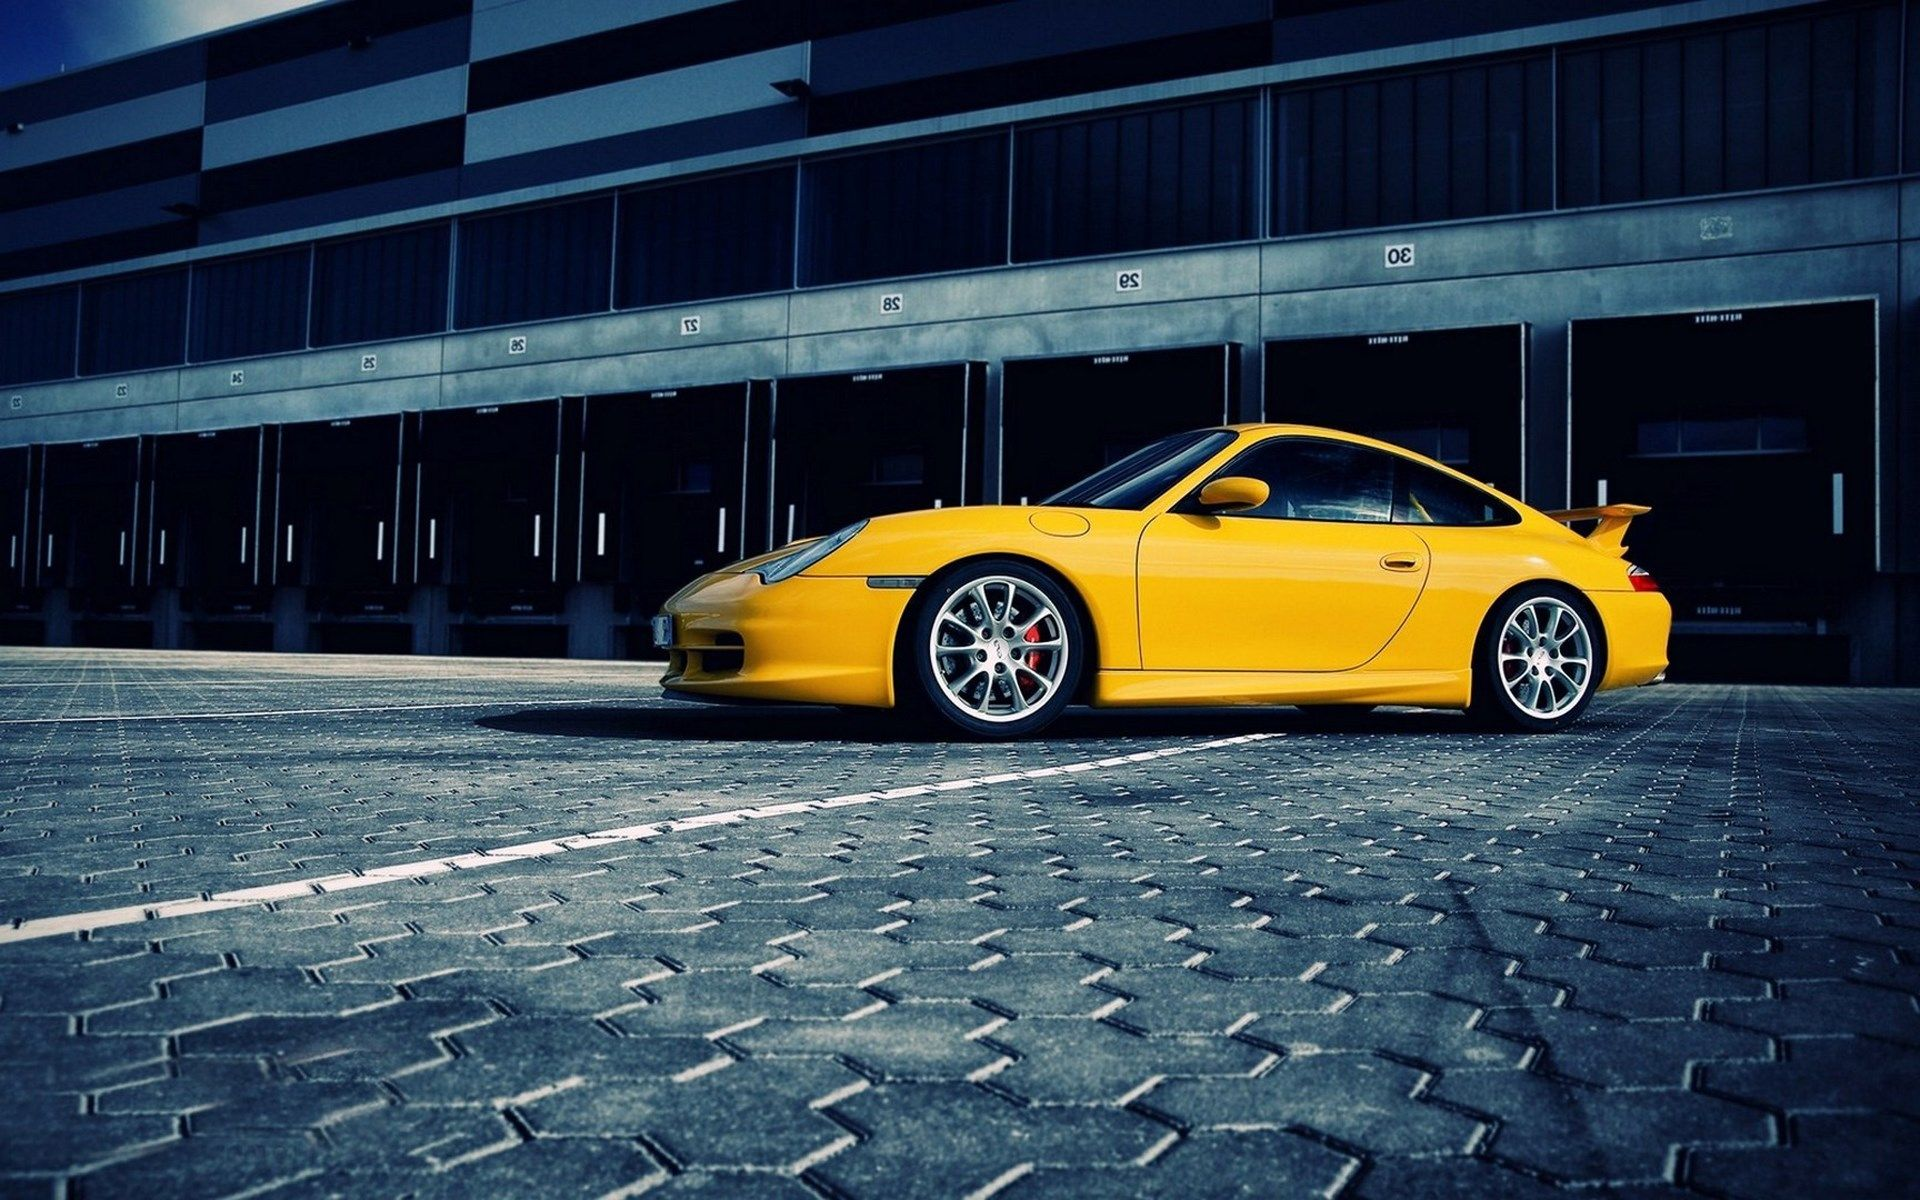 1920x1200 Free Download Pictures Of Porsche Porsche Porsche 9 Porsche Cars